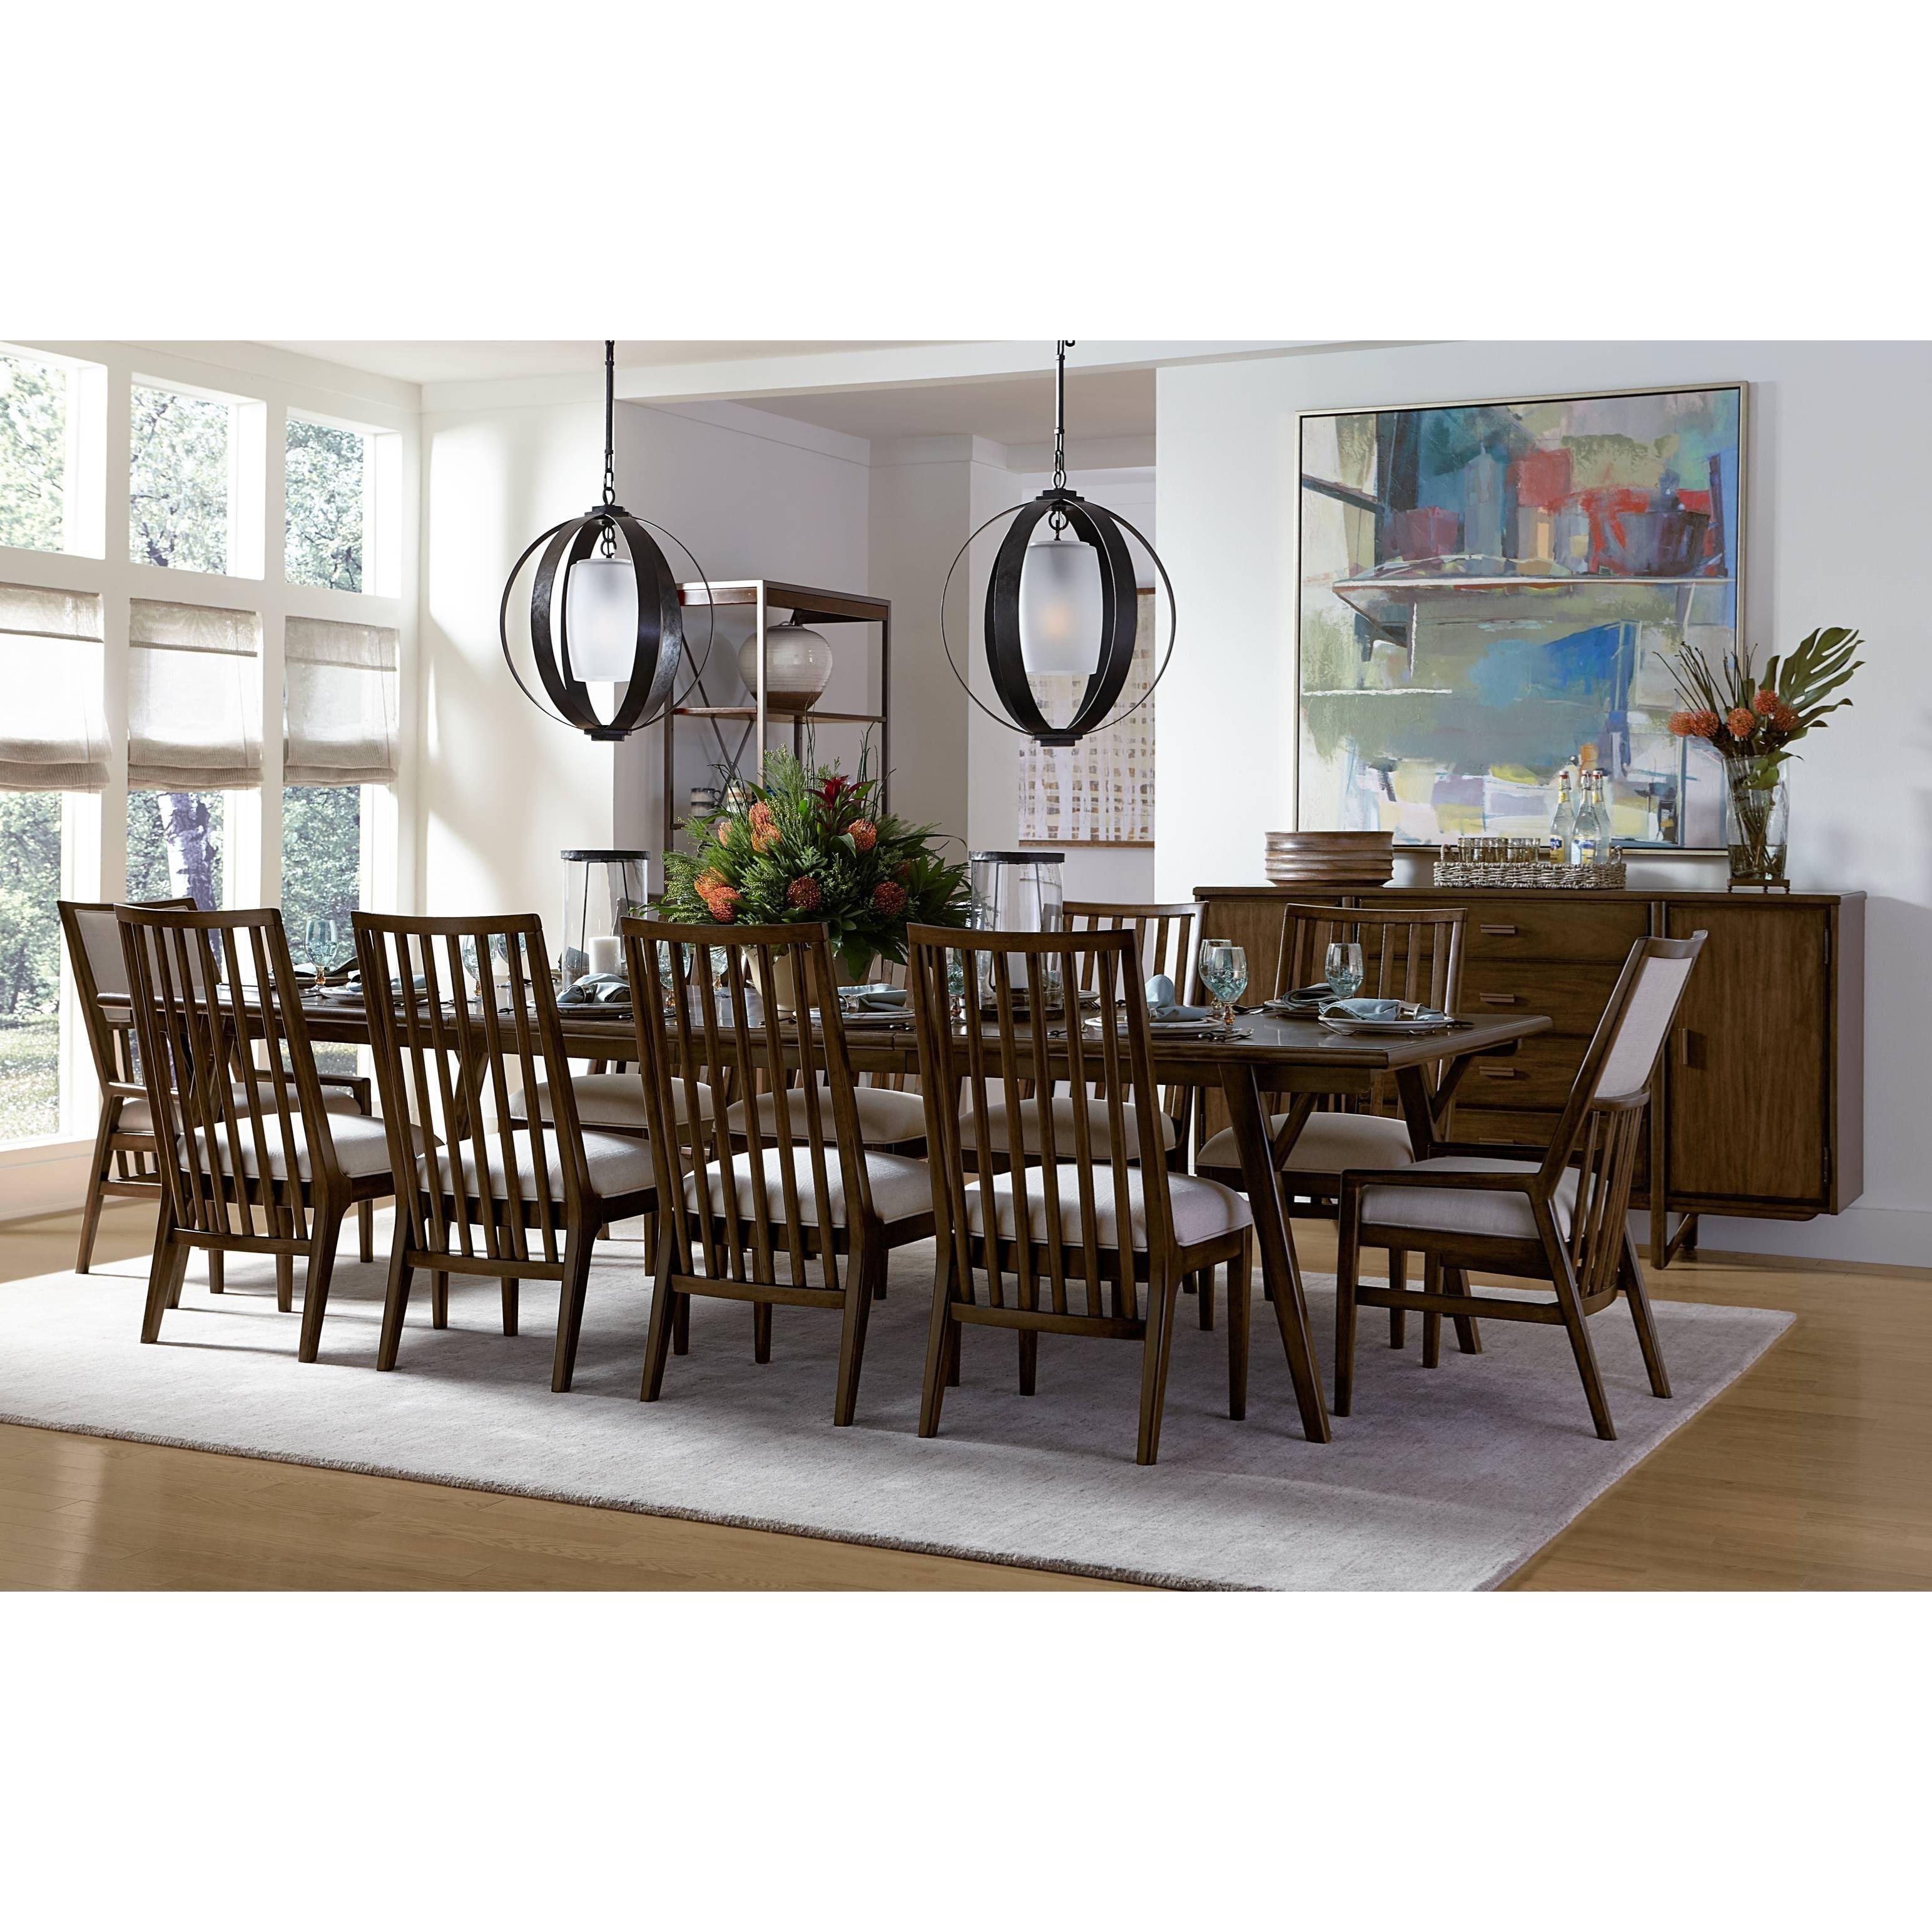 Stanley Furniture Santa Clara Formal Dining Room Group   Item Number  585 1  Dining. Stanley Furniture Santa Clara Formal Dining Room Group   Wayside